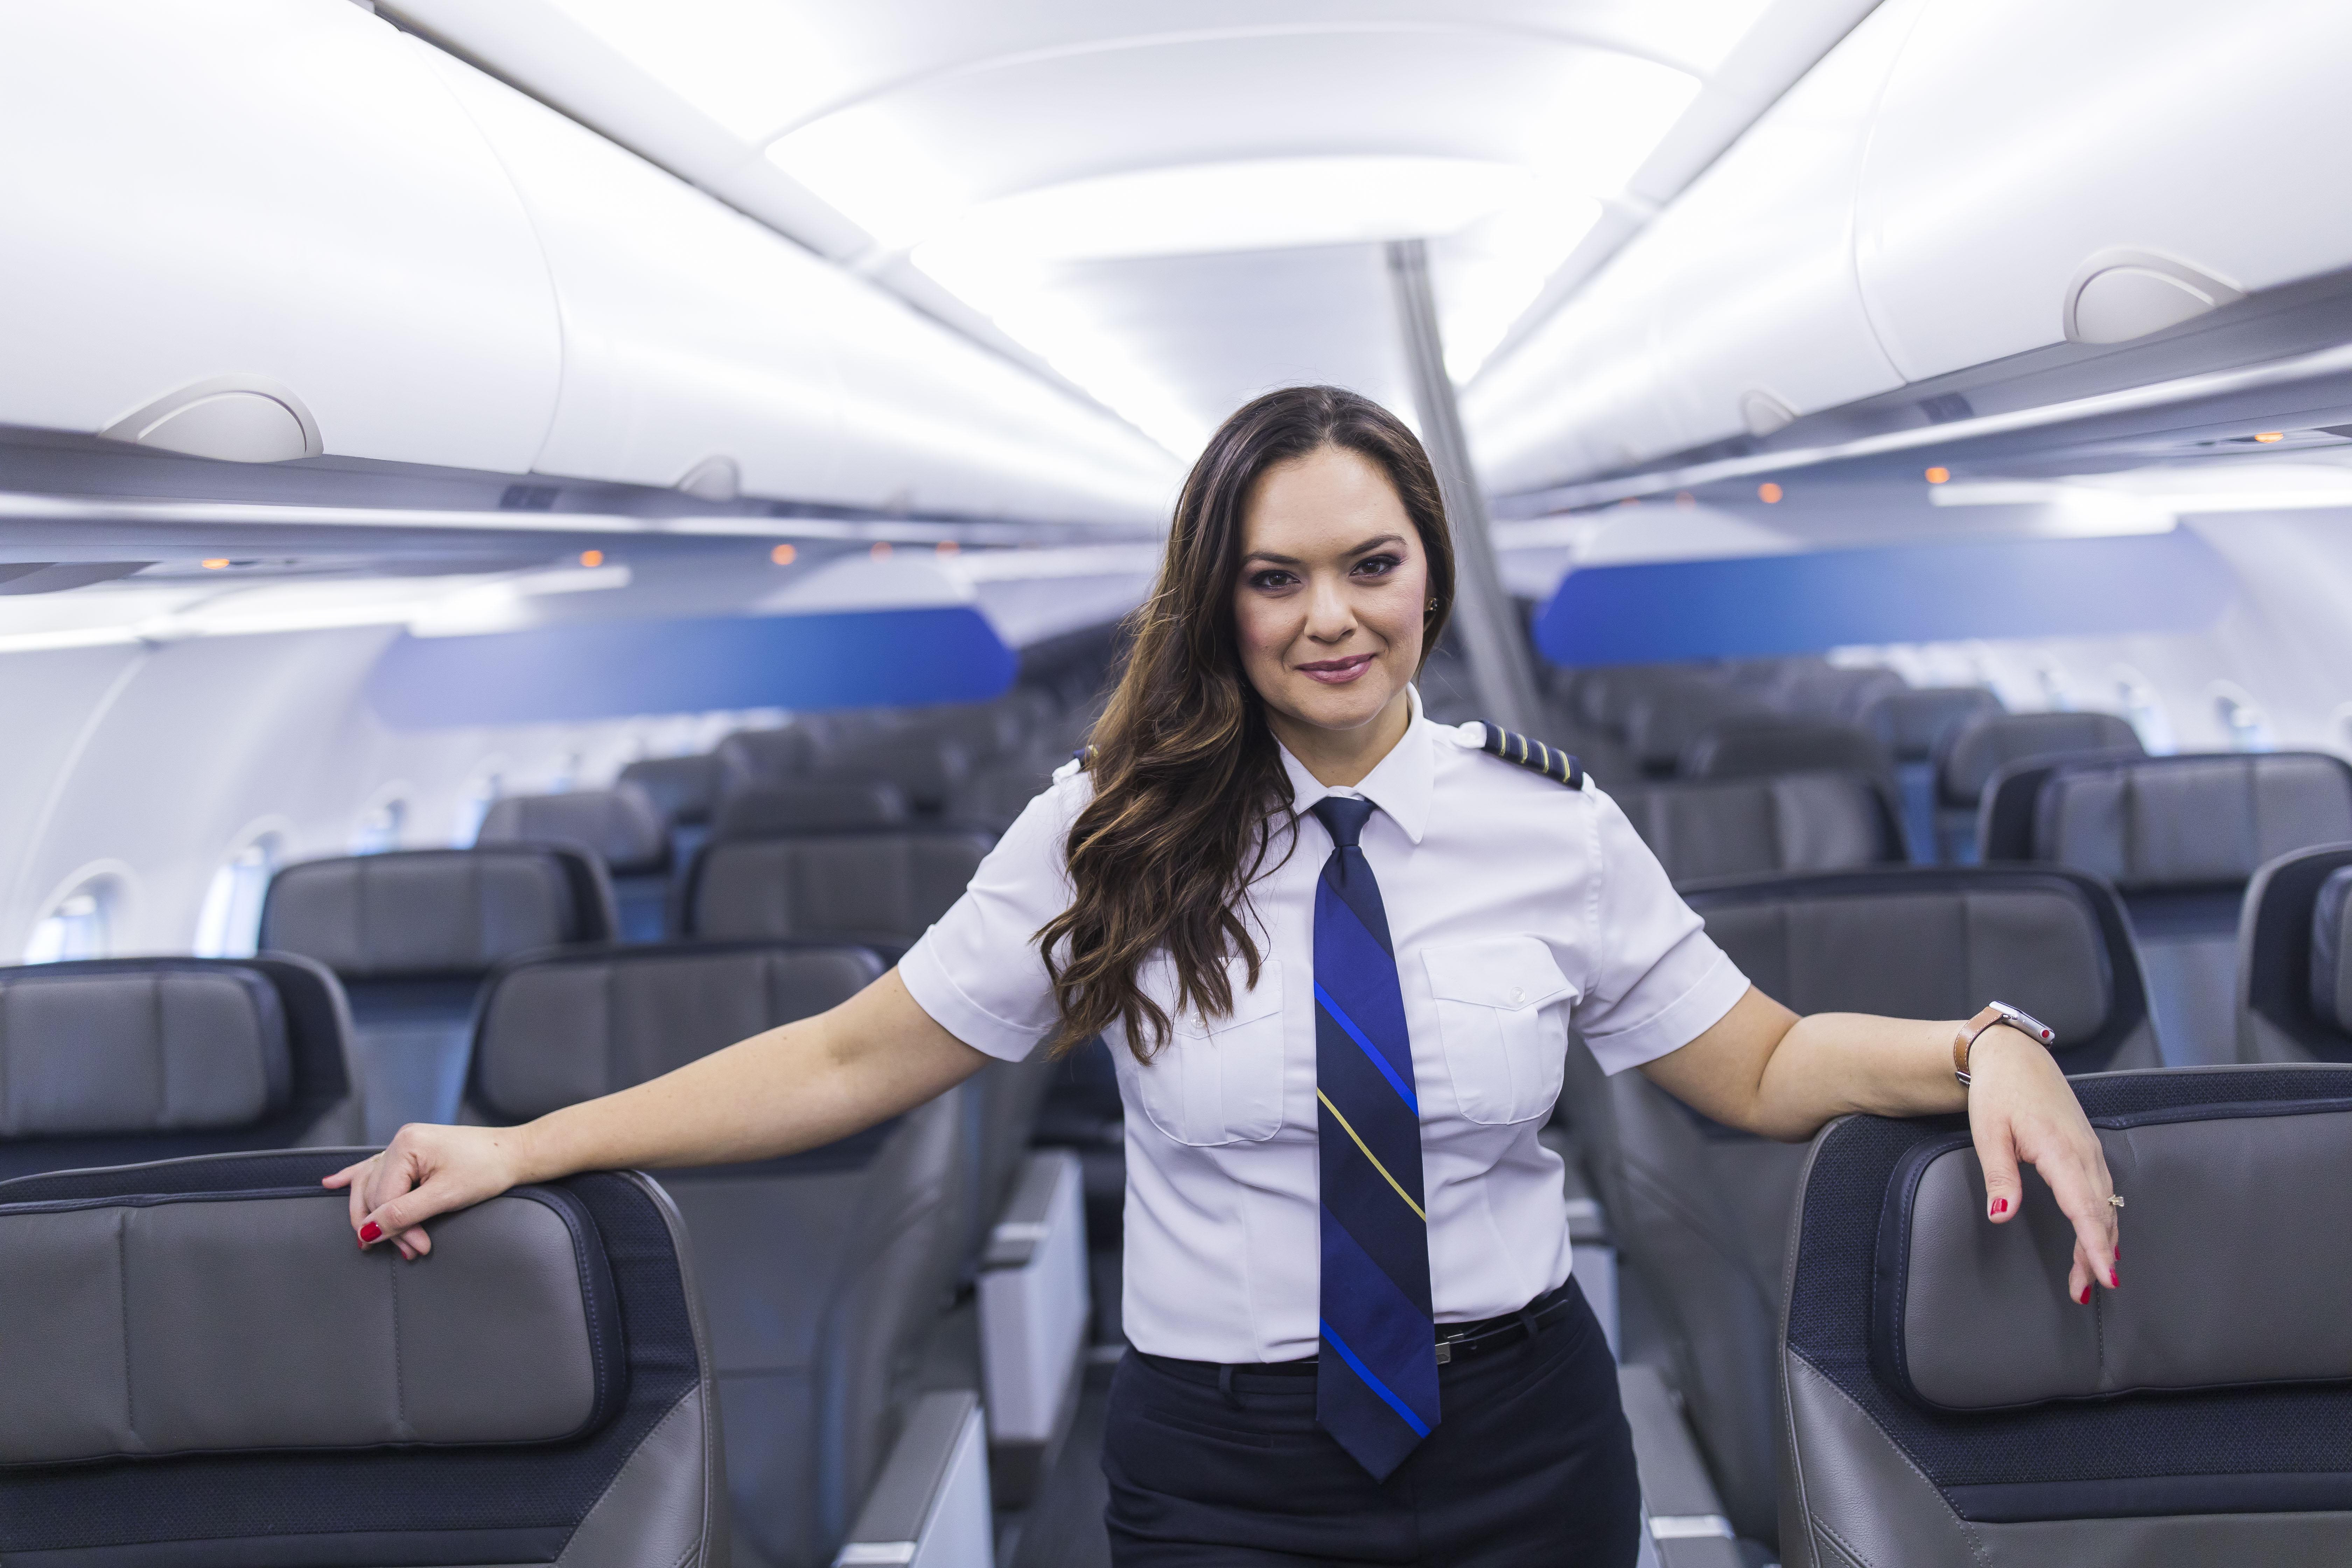 Flying for Alaska Airlines